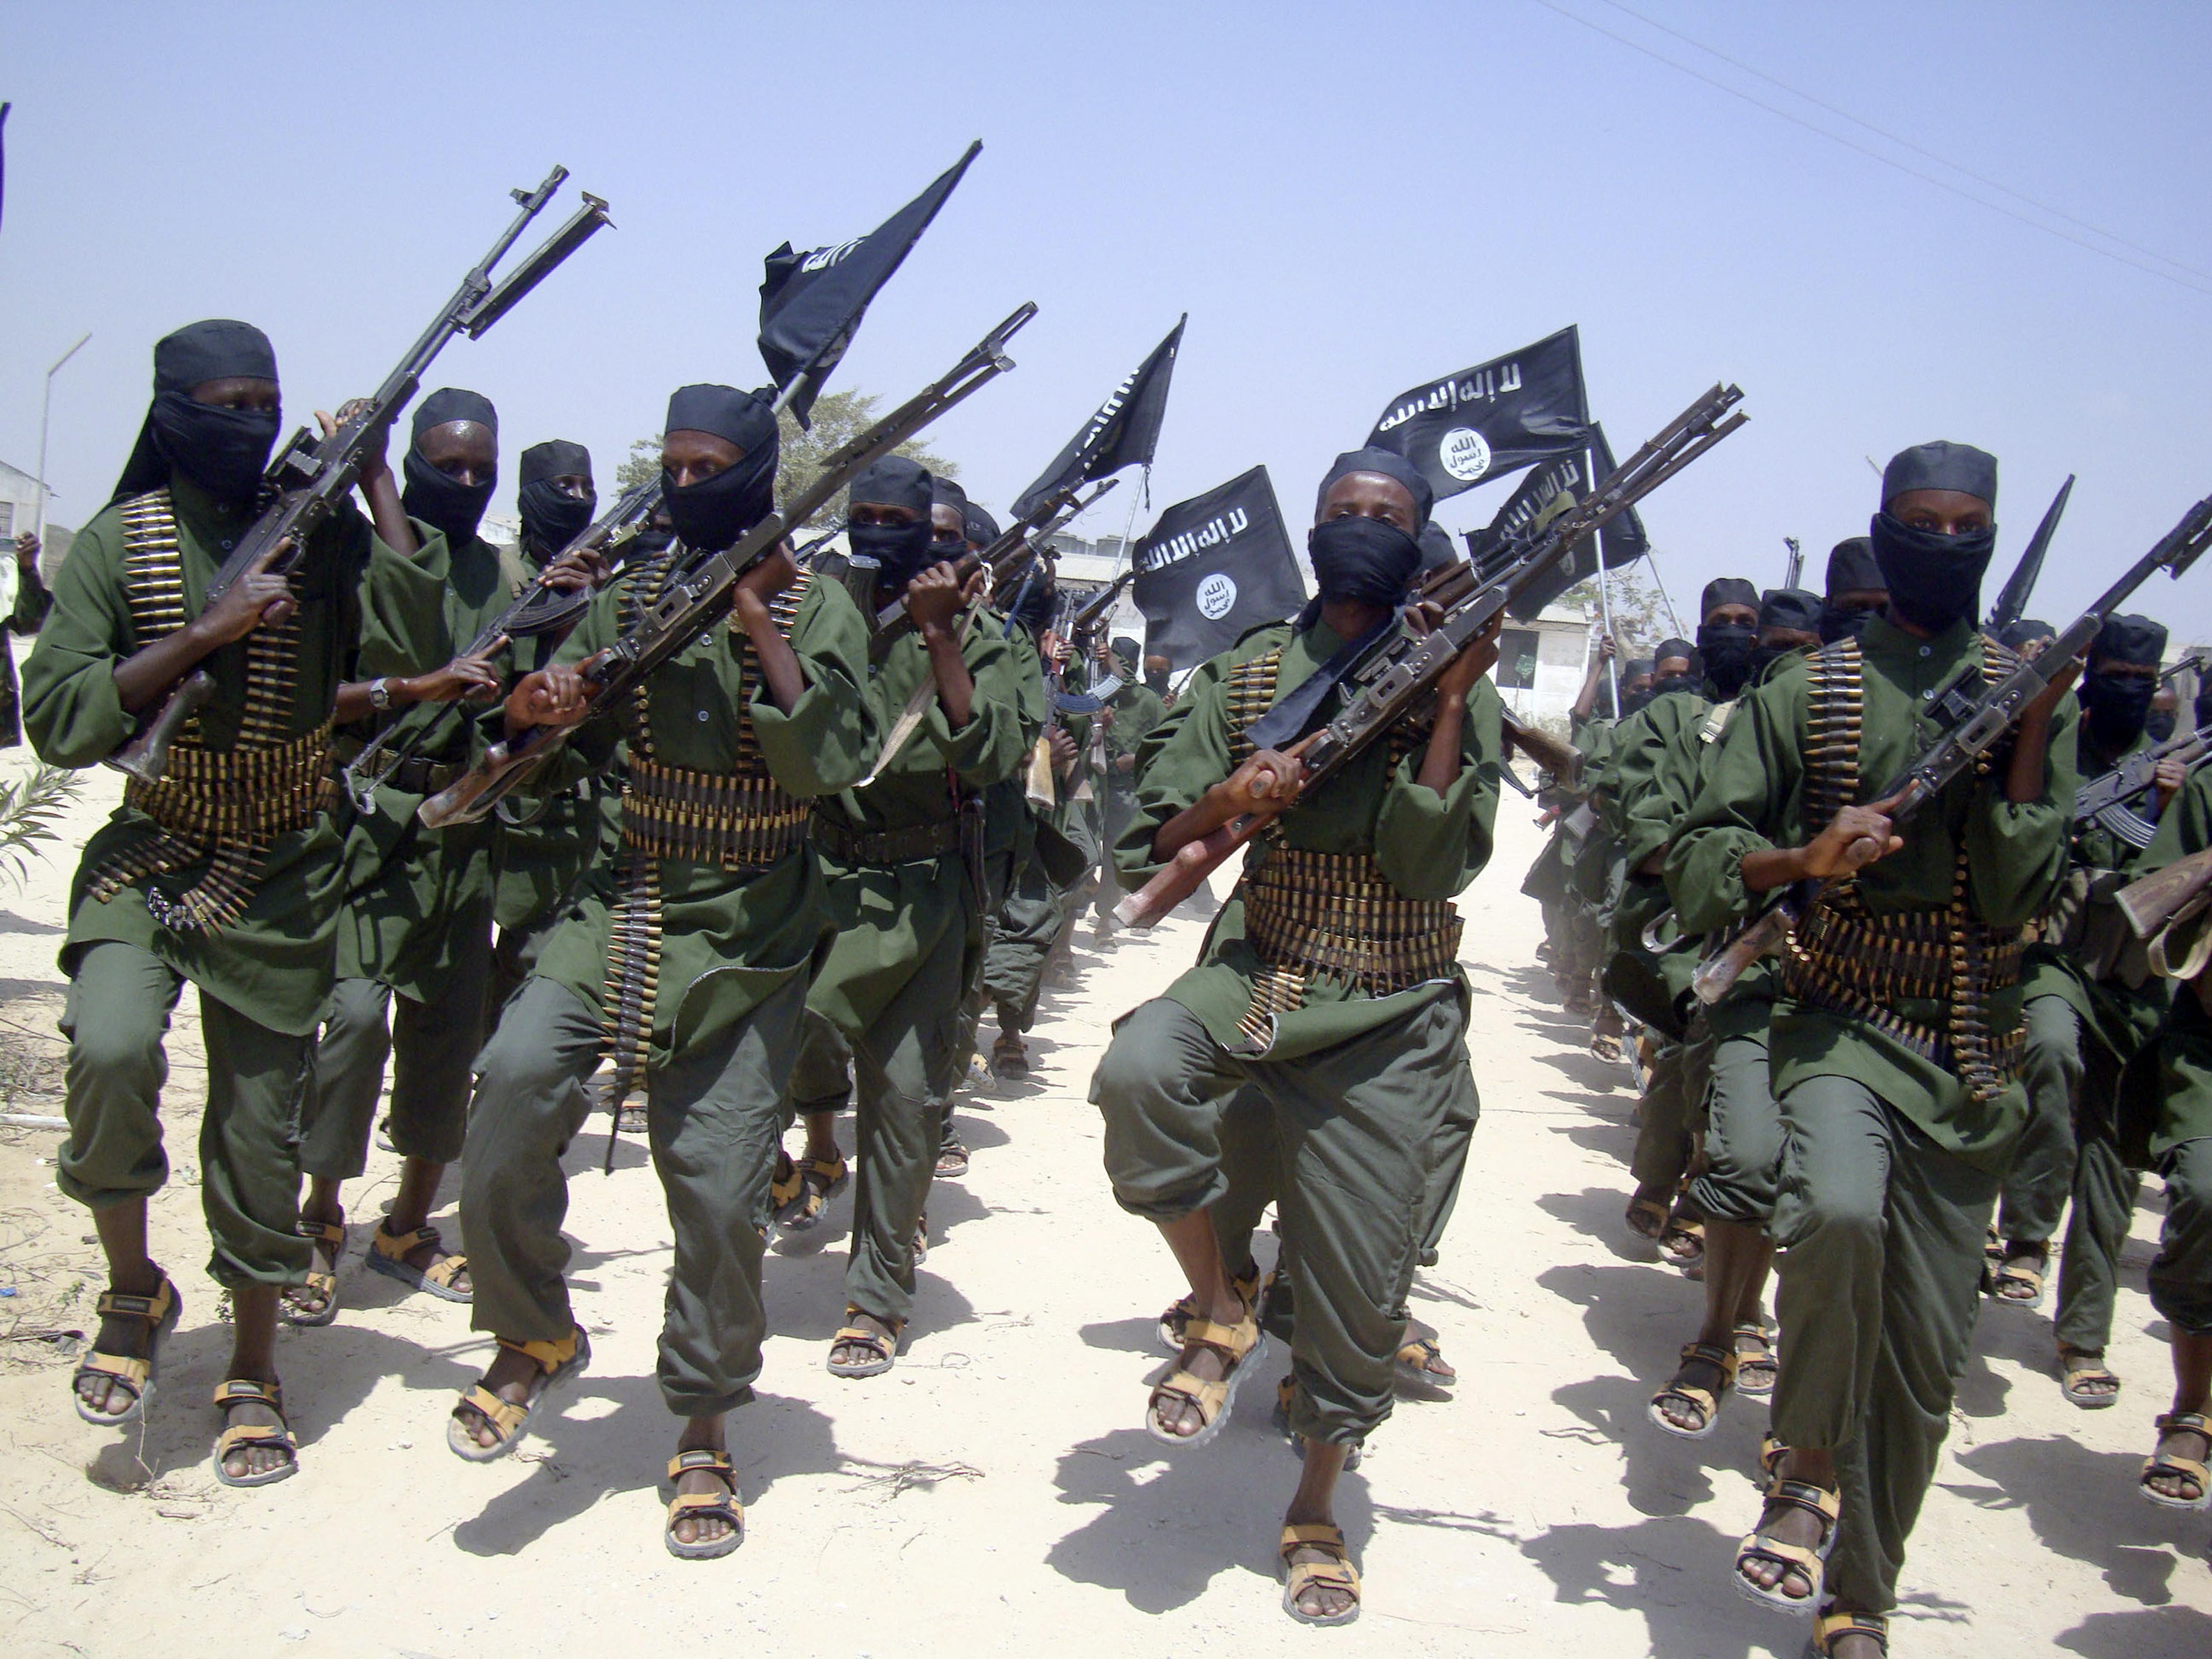 instagr al qaeda fighters attacked - HD5400×4050